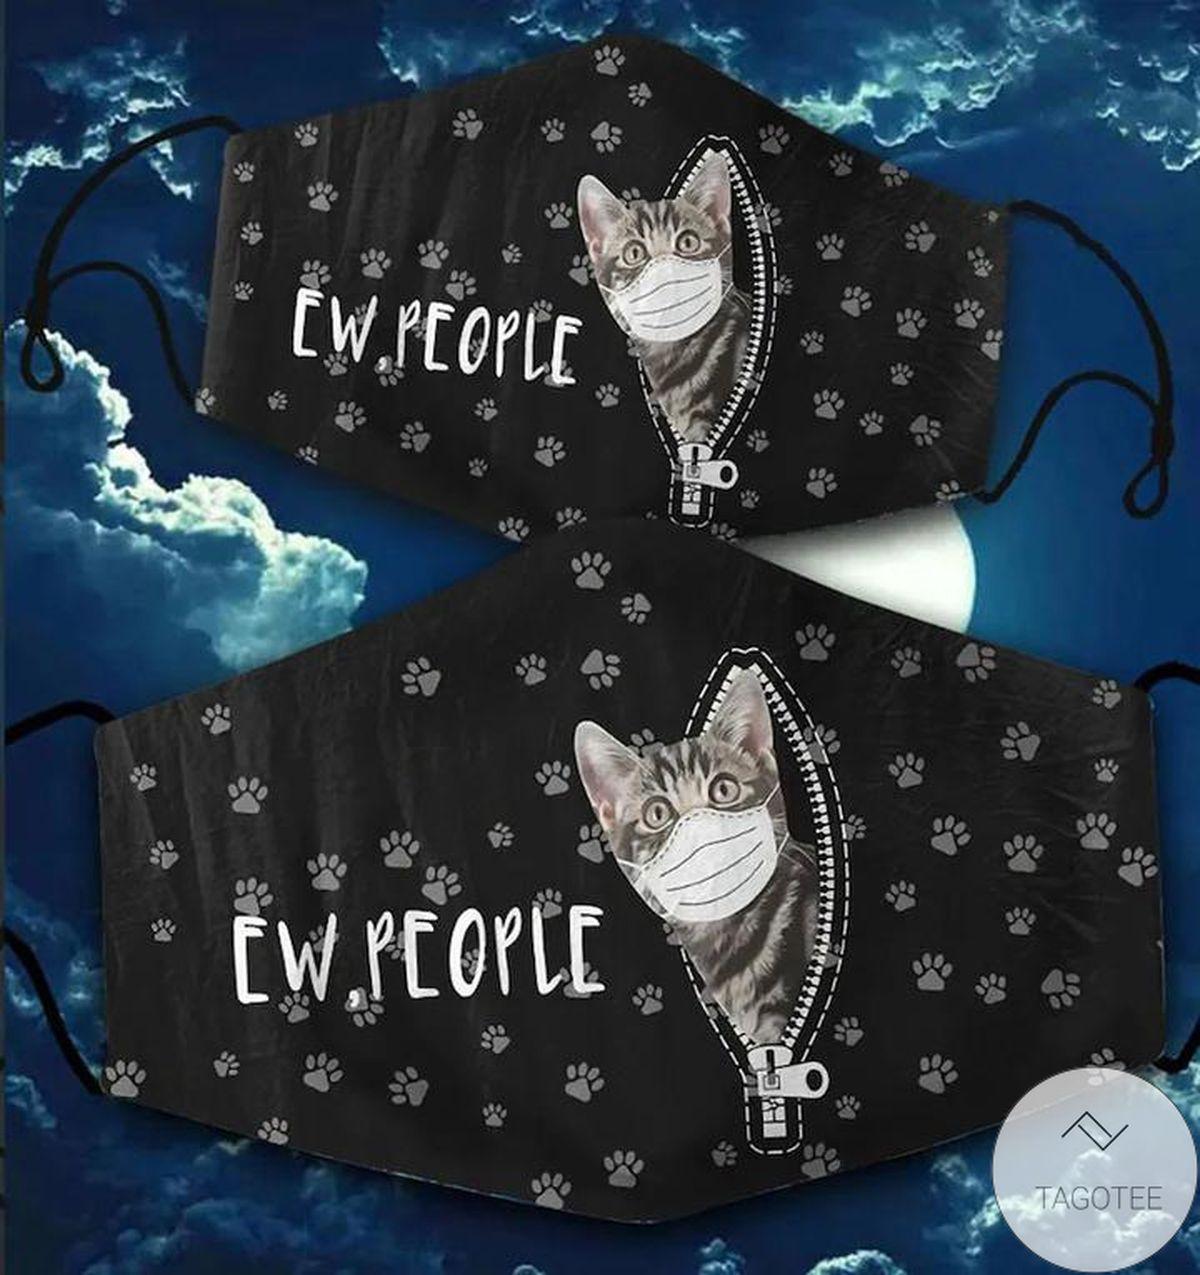 Ew People Black Cat Cloth Face Mask